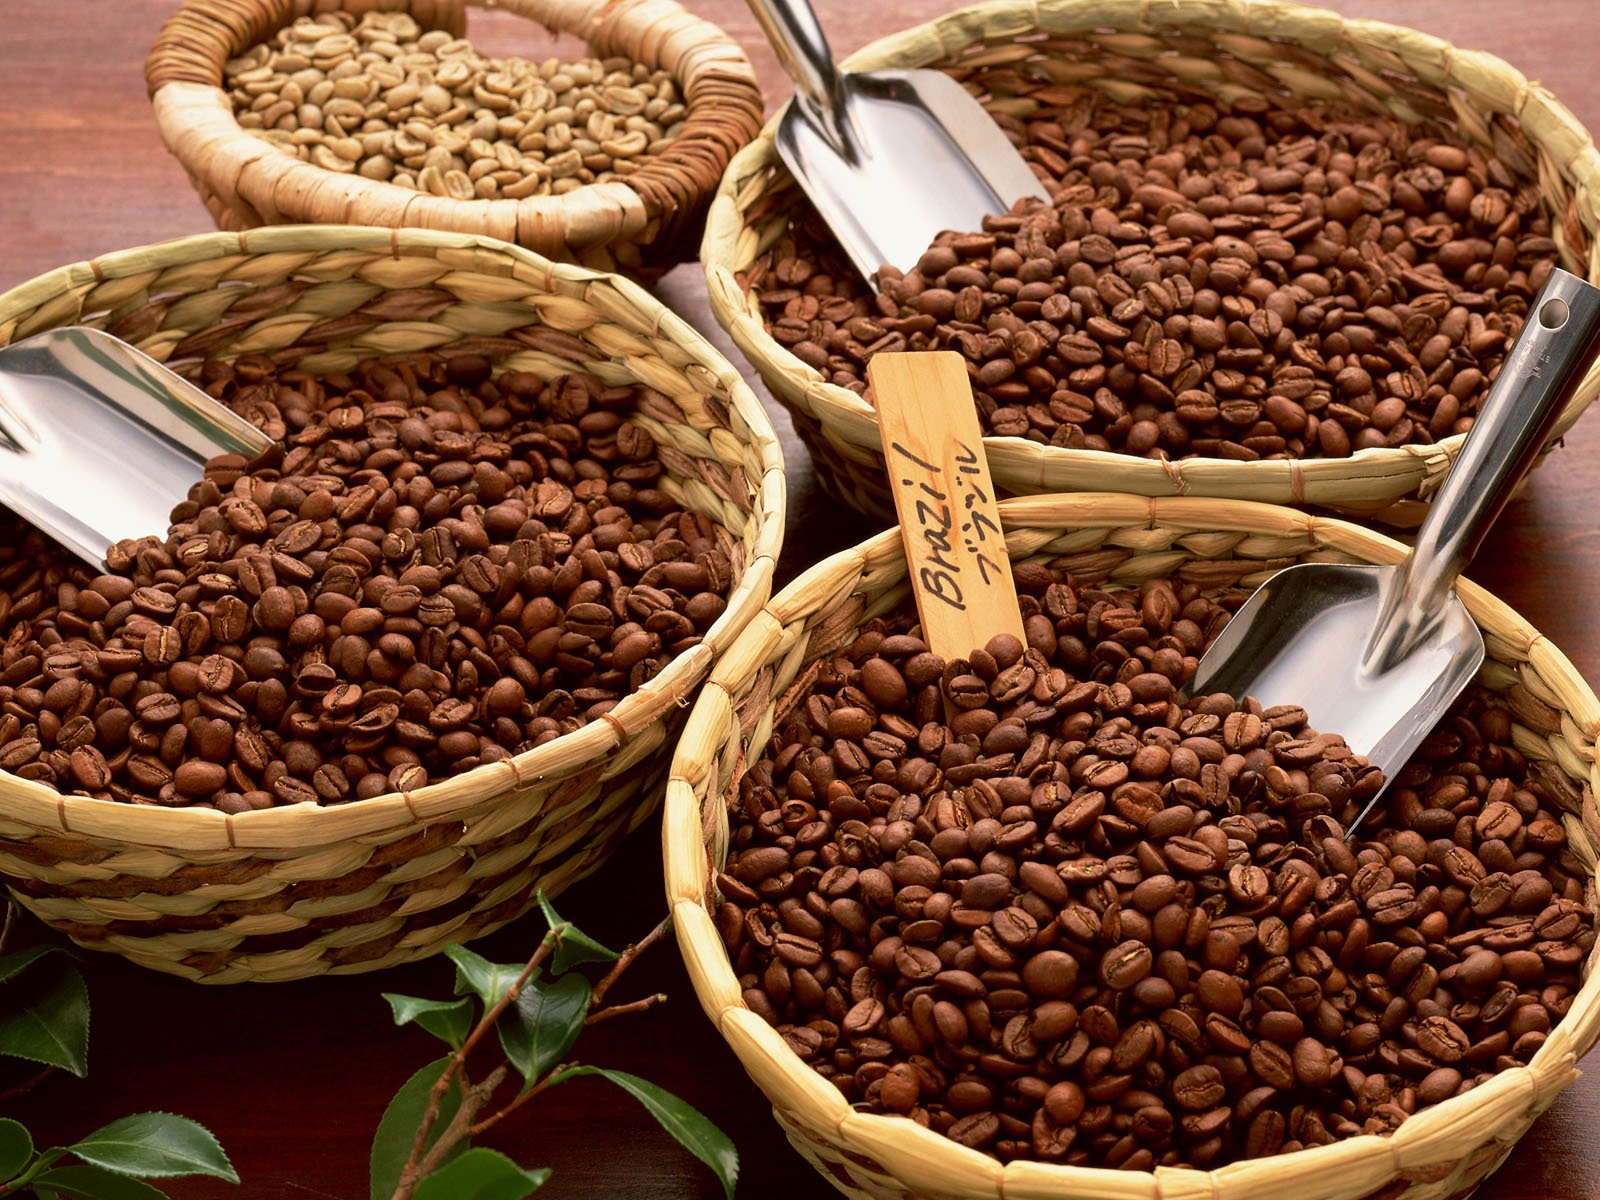 gia-cafe-rang-xay-nguyen-chat-khoang-bao-nhieu-1-kg-03